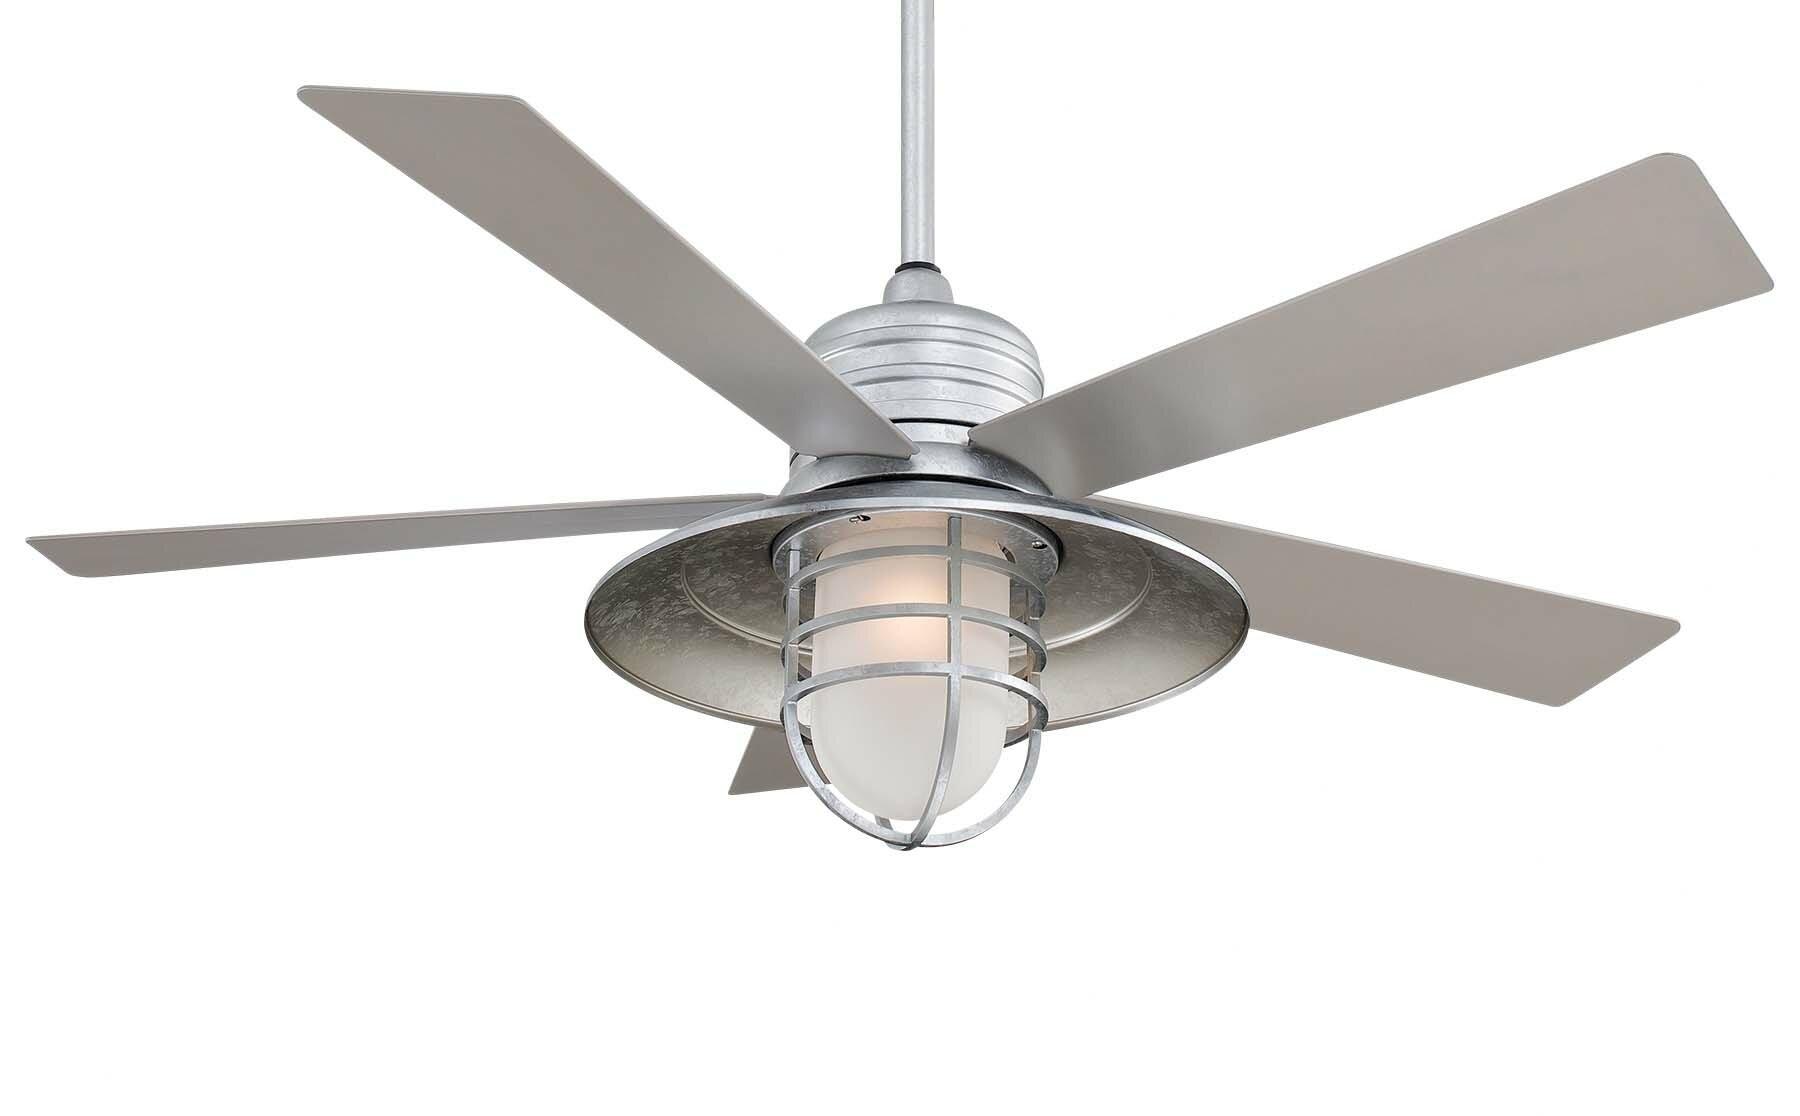 Minka Aire 54 Rainman 5 Blade Outdoor Ceiling Fan Light Kit Included Reviews Wayfair